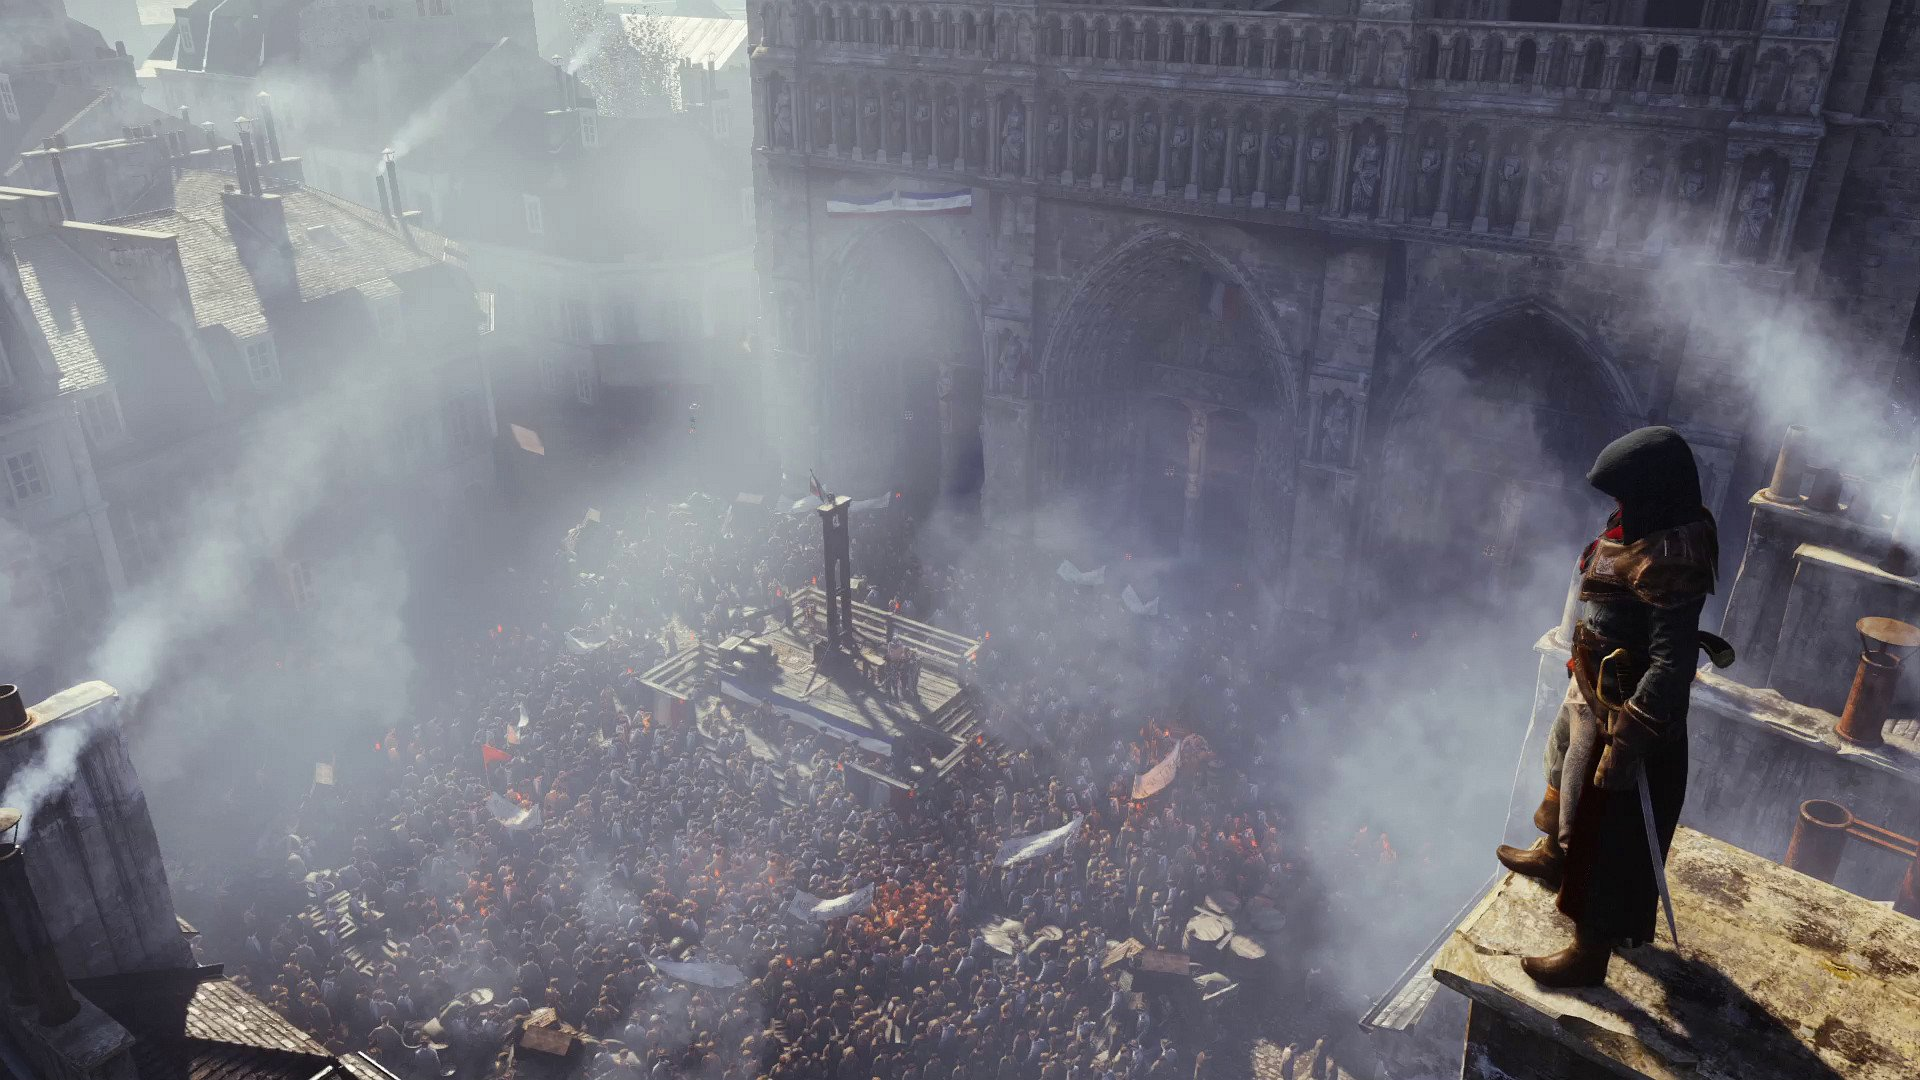 assassin  039 s creed unity 2492316 با اولین تصاویر از Assassin's Creed : Unity همراه شوید : بازی تنها بر روی نسل هشتم منتشر خواهد شد